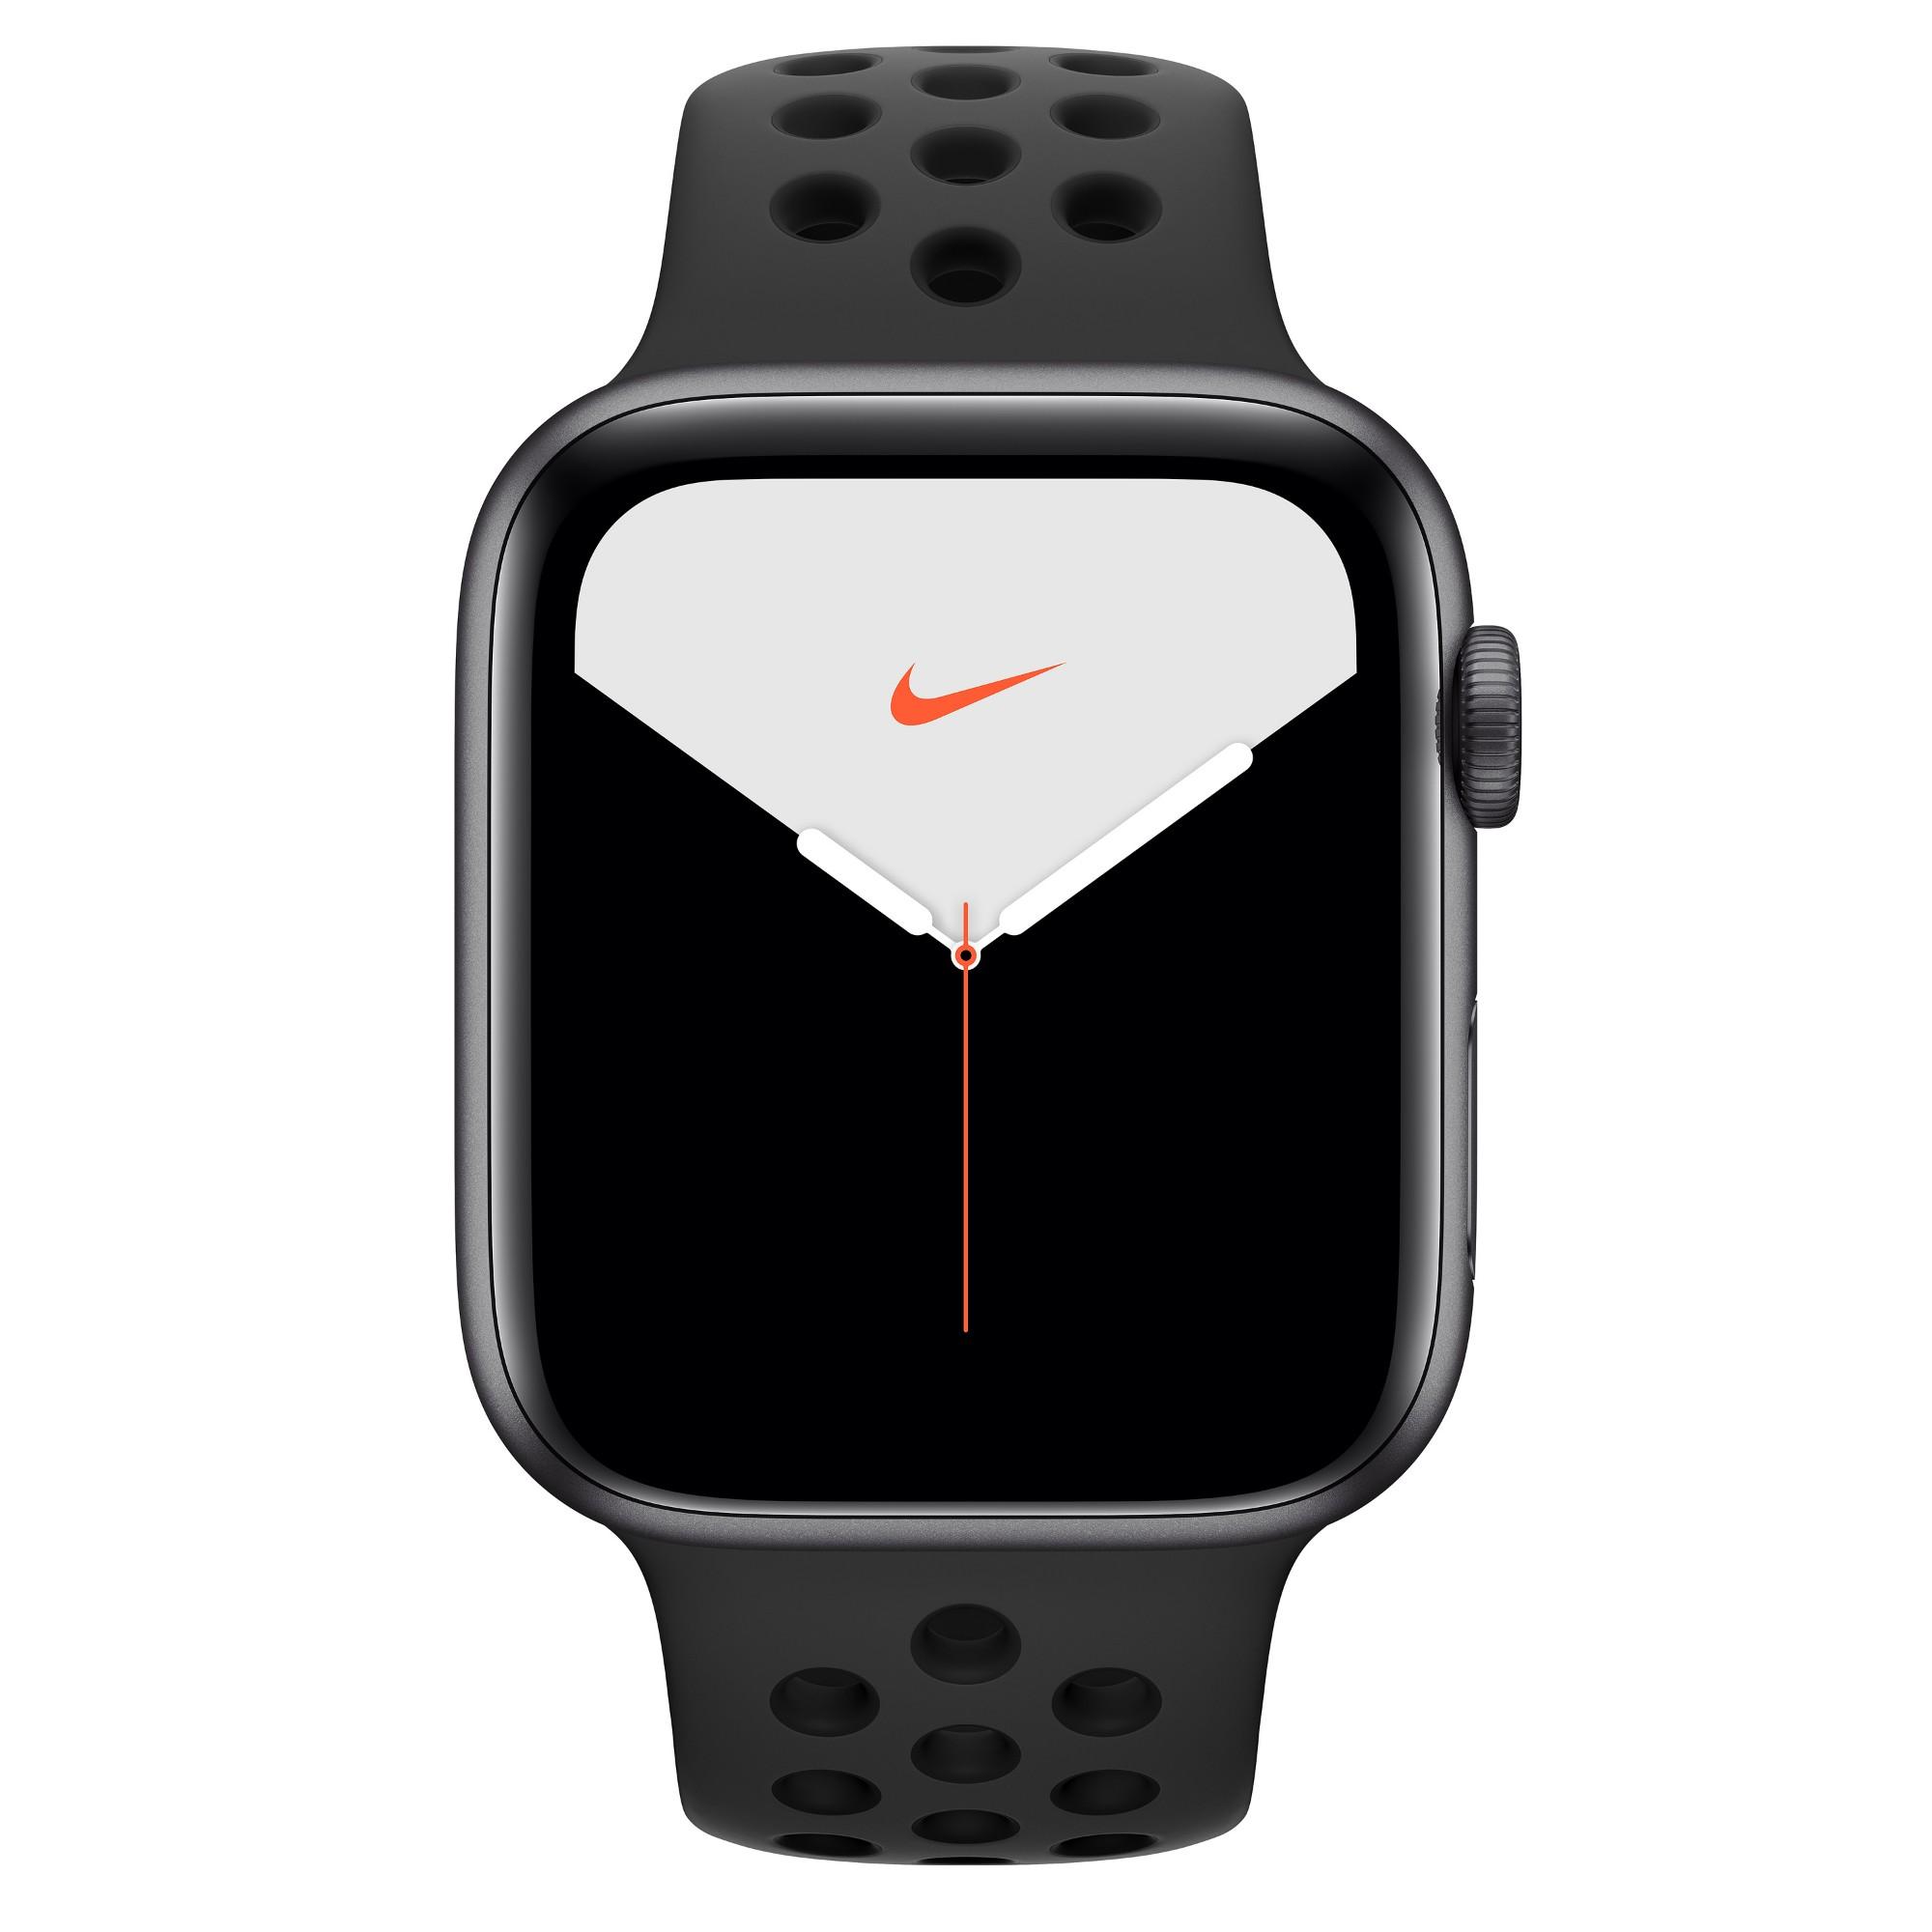 Apple Watch Nike Series 5 smartwatch Grey OLED Cellular GPS satellite